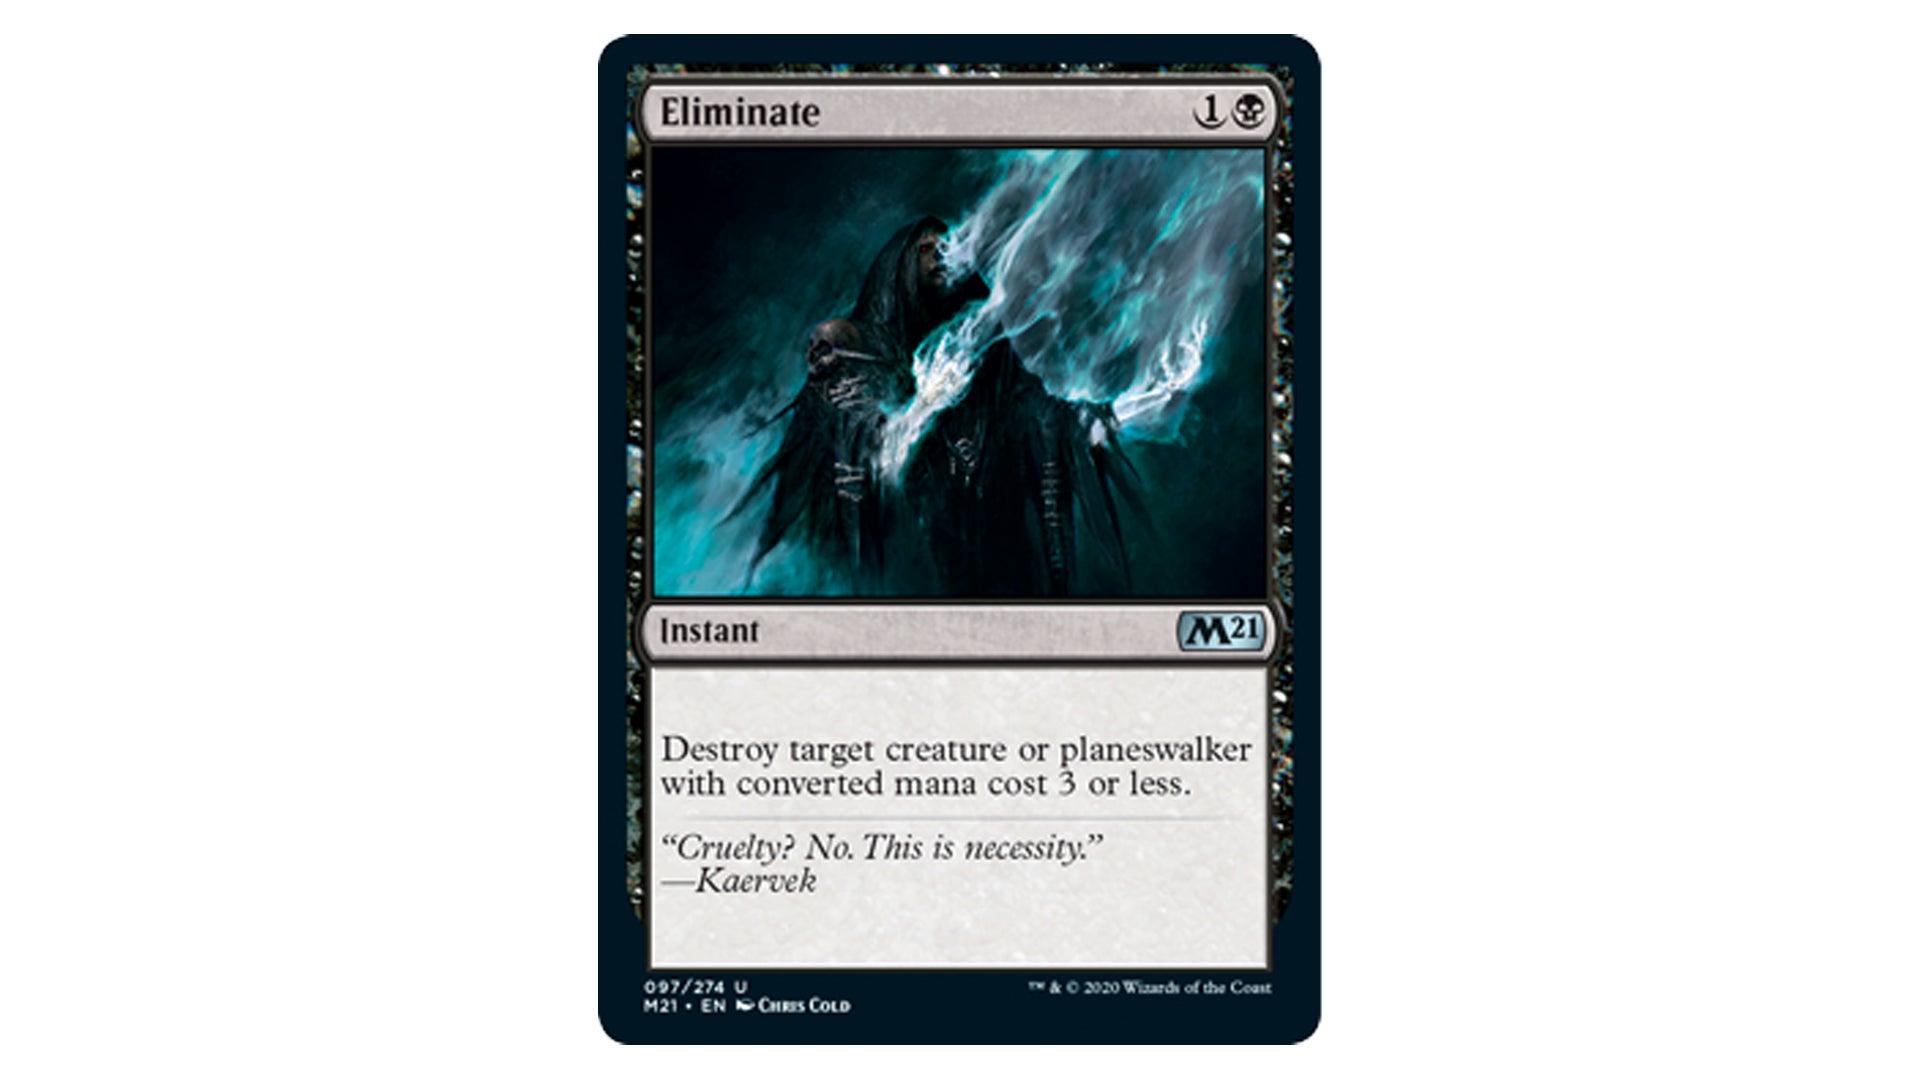 mtg-m21-card-eliminate.jpg